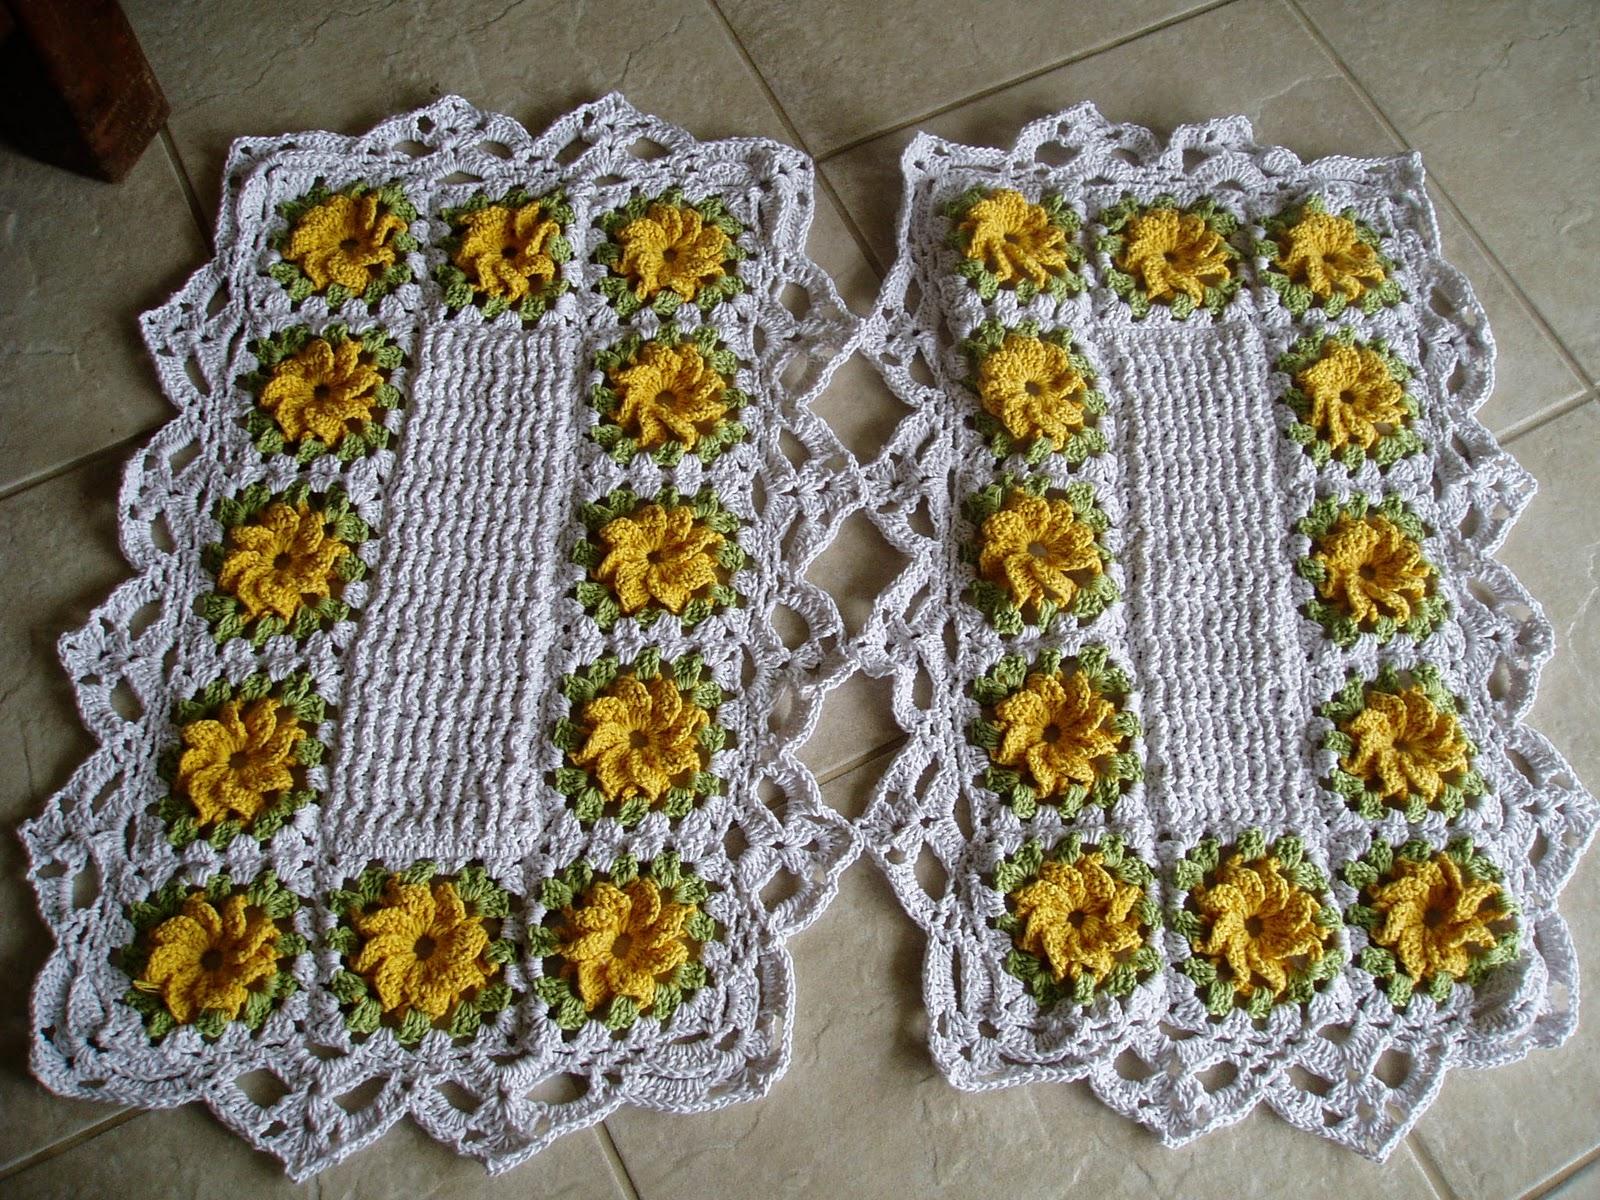 tecendo receitas tapetes de croche floral amarelo. Black Bedroom Furniture Sets. Home Design Ideas